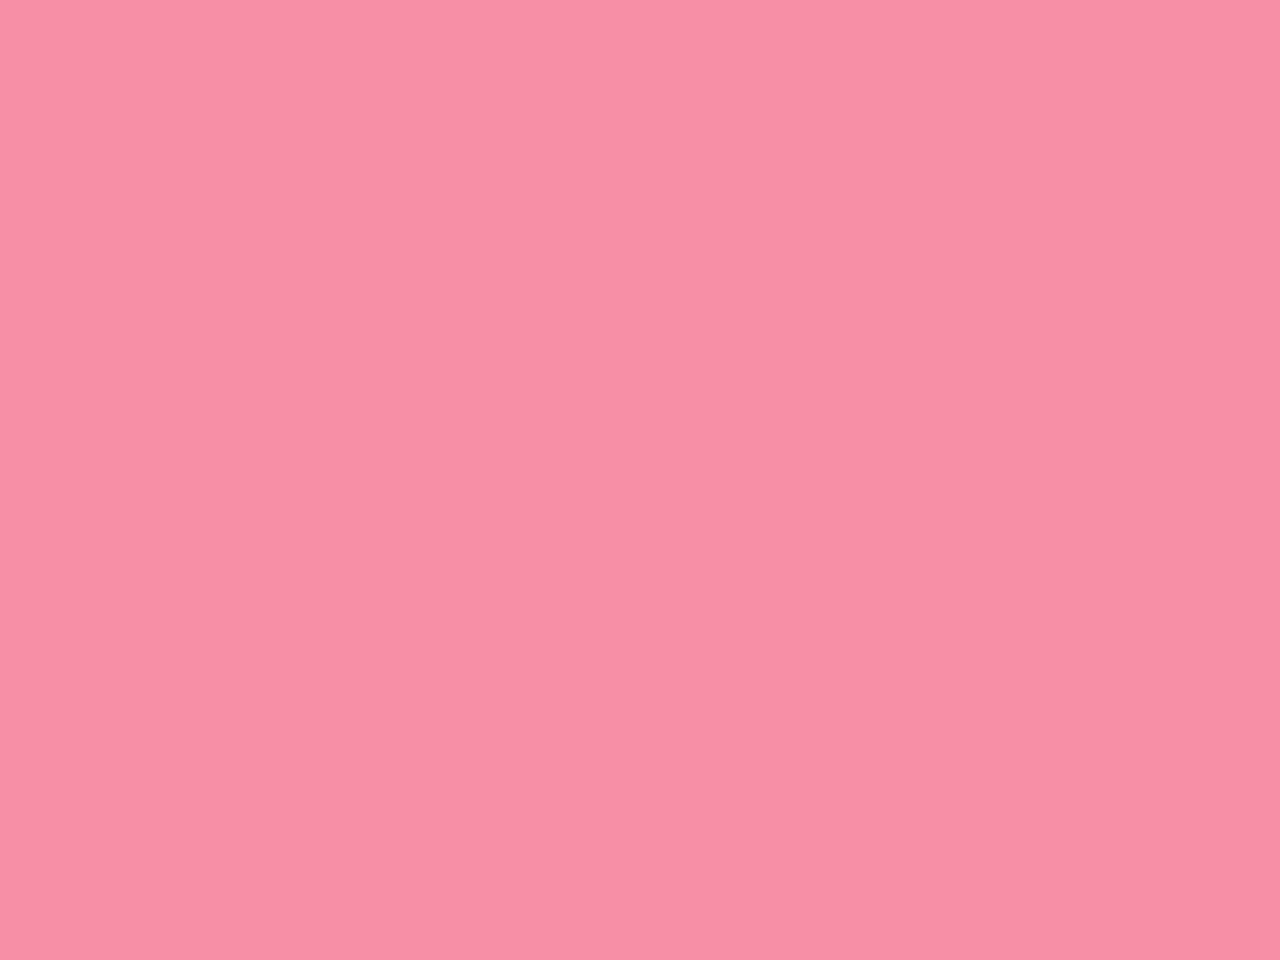 1280x960 Pink Sherbet Solid Color Background